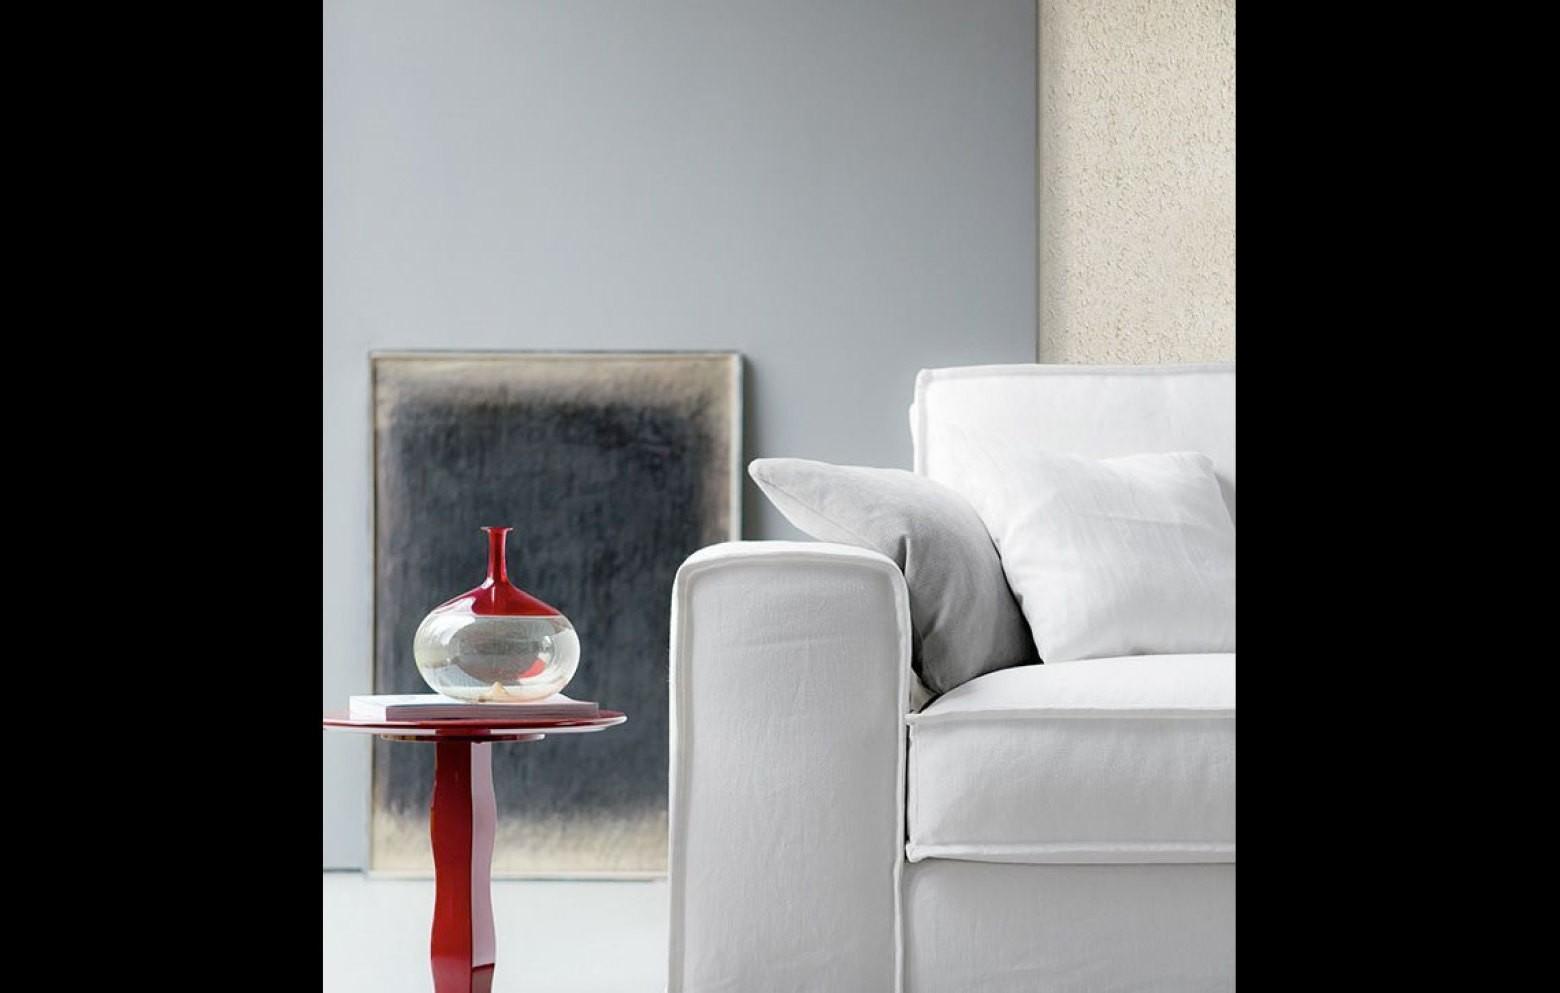 santorini ecksofas polsterm bel who 39 s perfect. Black Bedroom Furniture Sets. Home Design Ideas